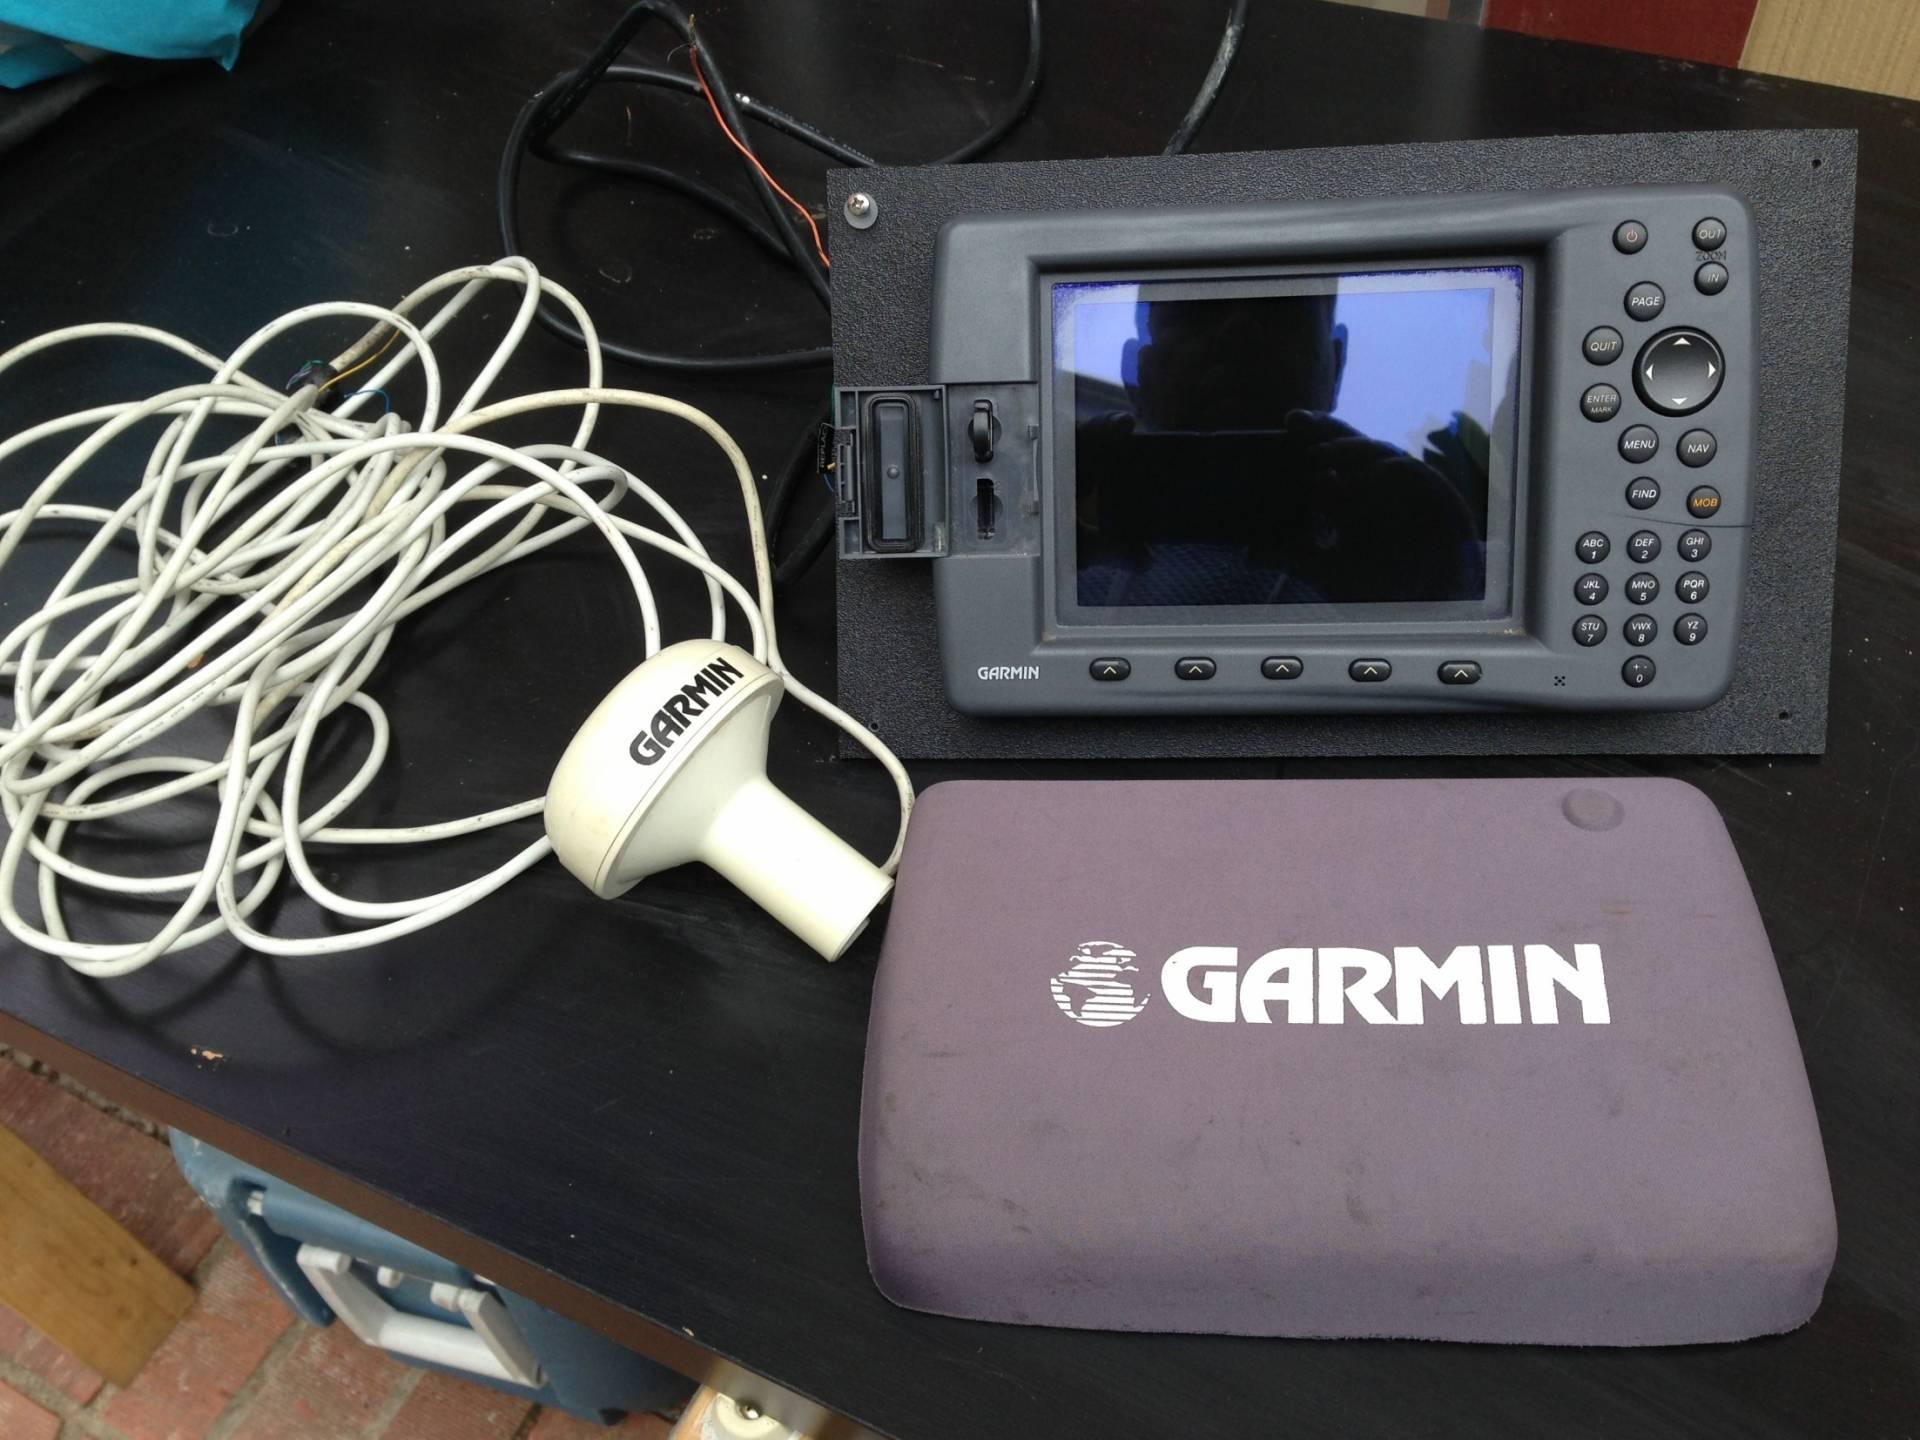 garmin mini usb wiring diagram 3 phase motor contactor gps 17 antenna : 36 images - diagrams | creativeand.co